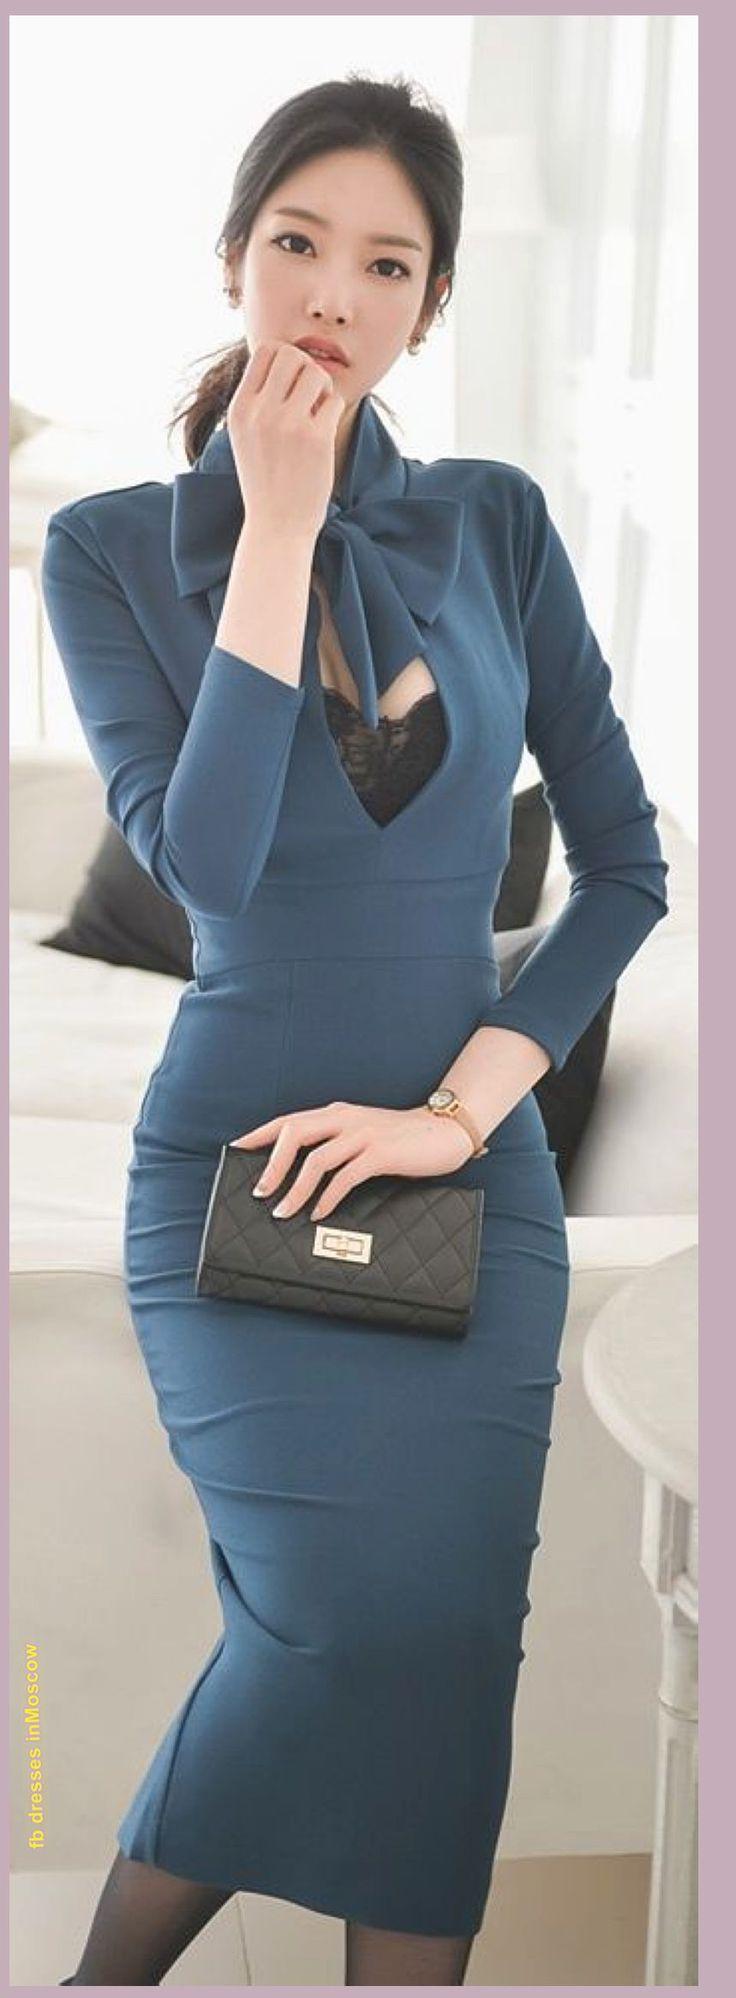 best dresses images on pinterest beautiful clothes dress skirt